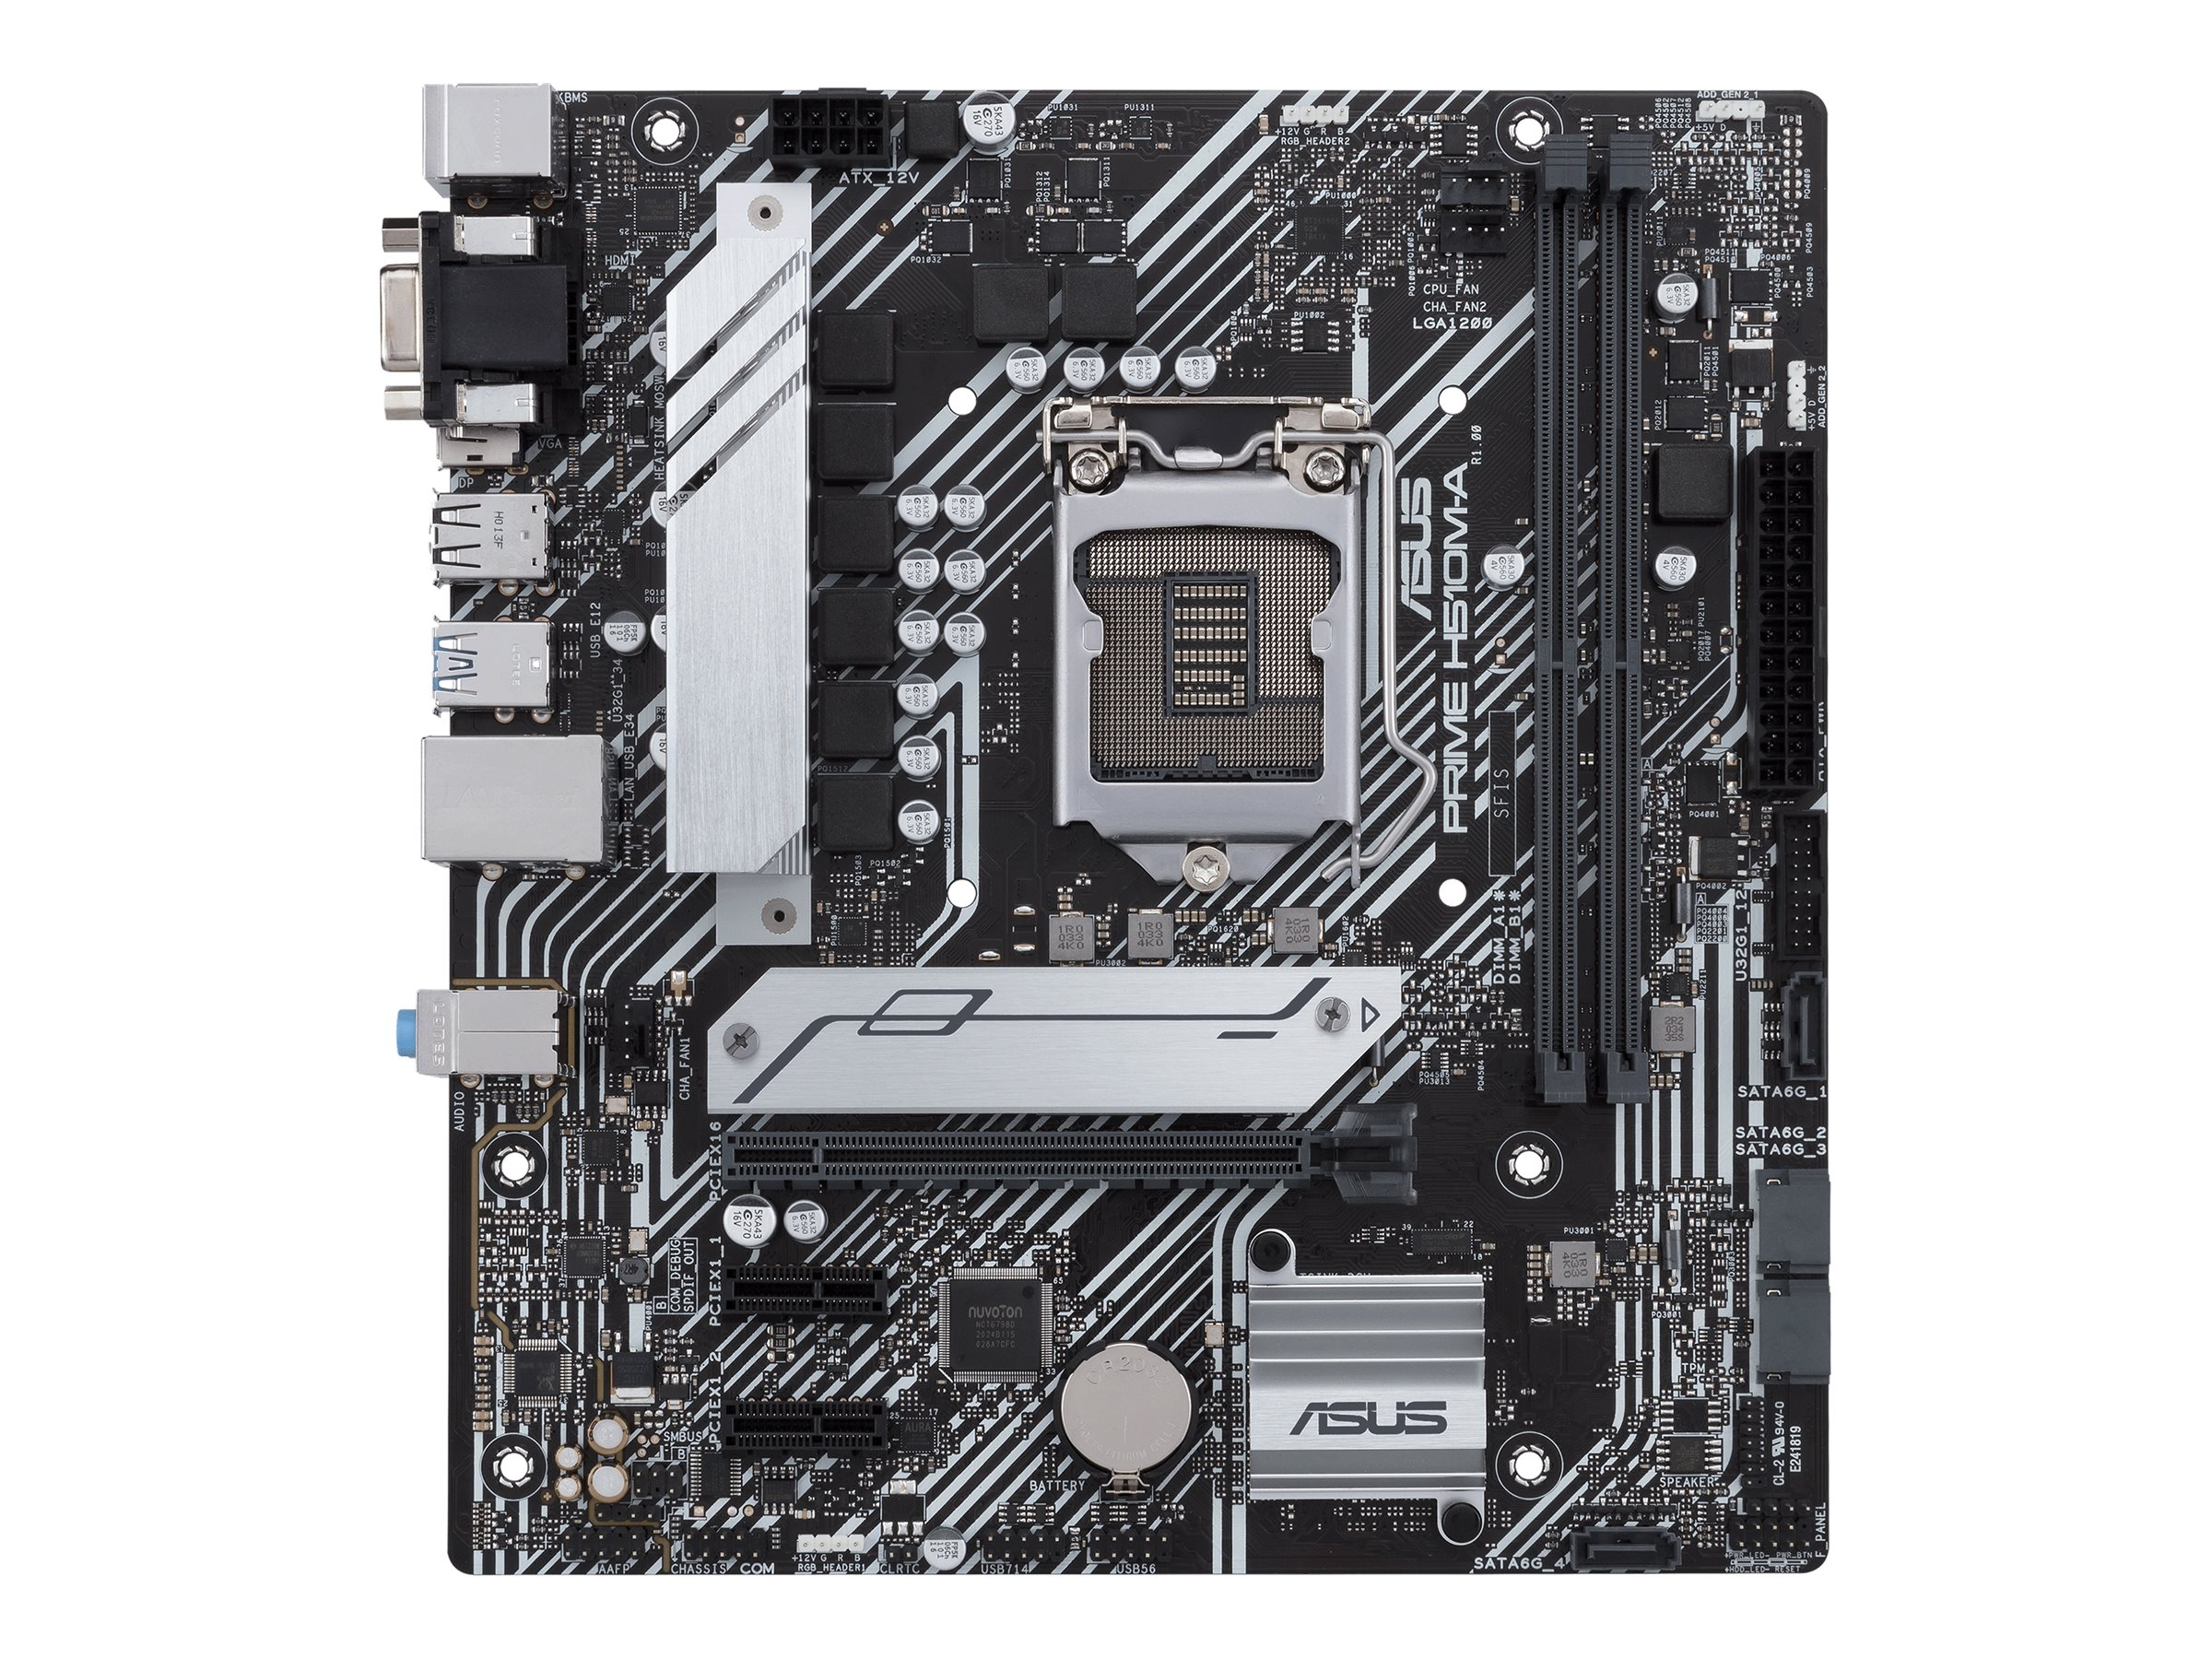 Vorschau: ASUS PRIME H510M-A - Motherboard - micro ATX - LGA1200-Sockel - H510 - USB 3.2 Gen 1 - Gigabit LAN - Onboard-Grafik (CPU erforderlich)